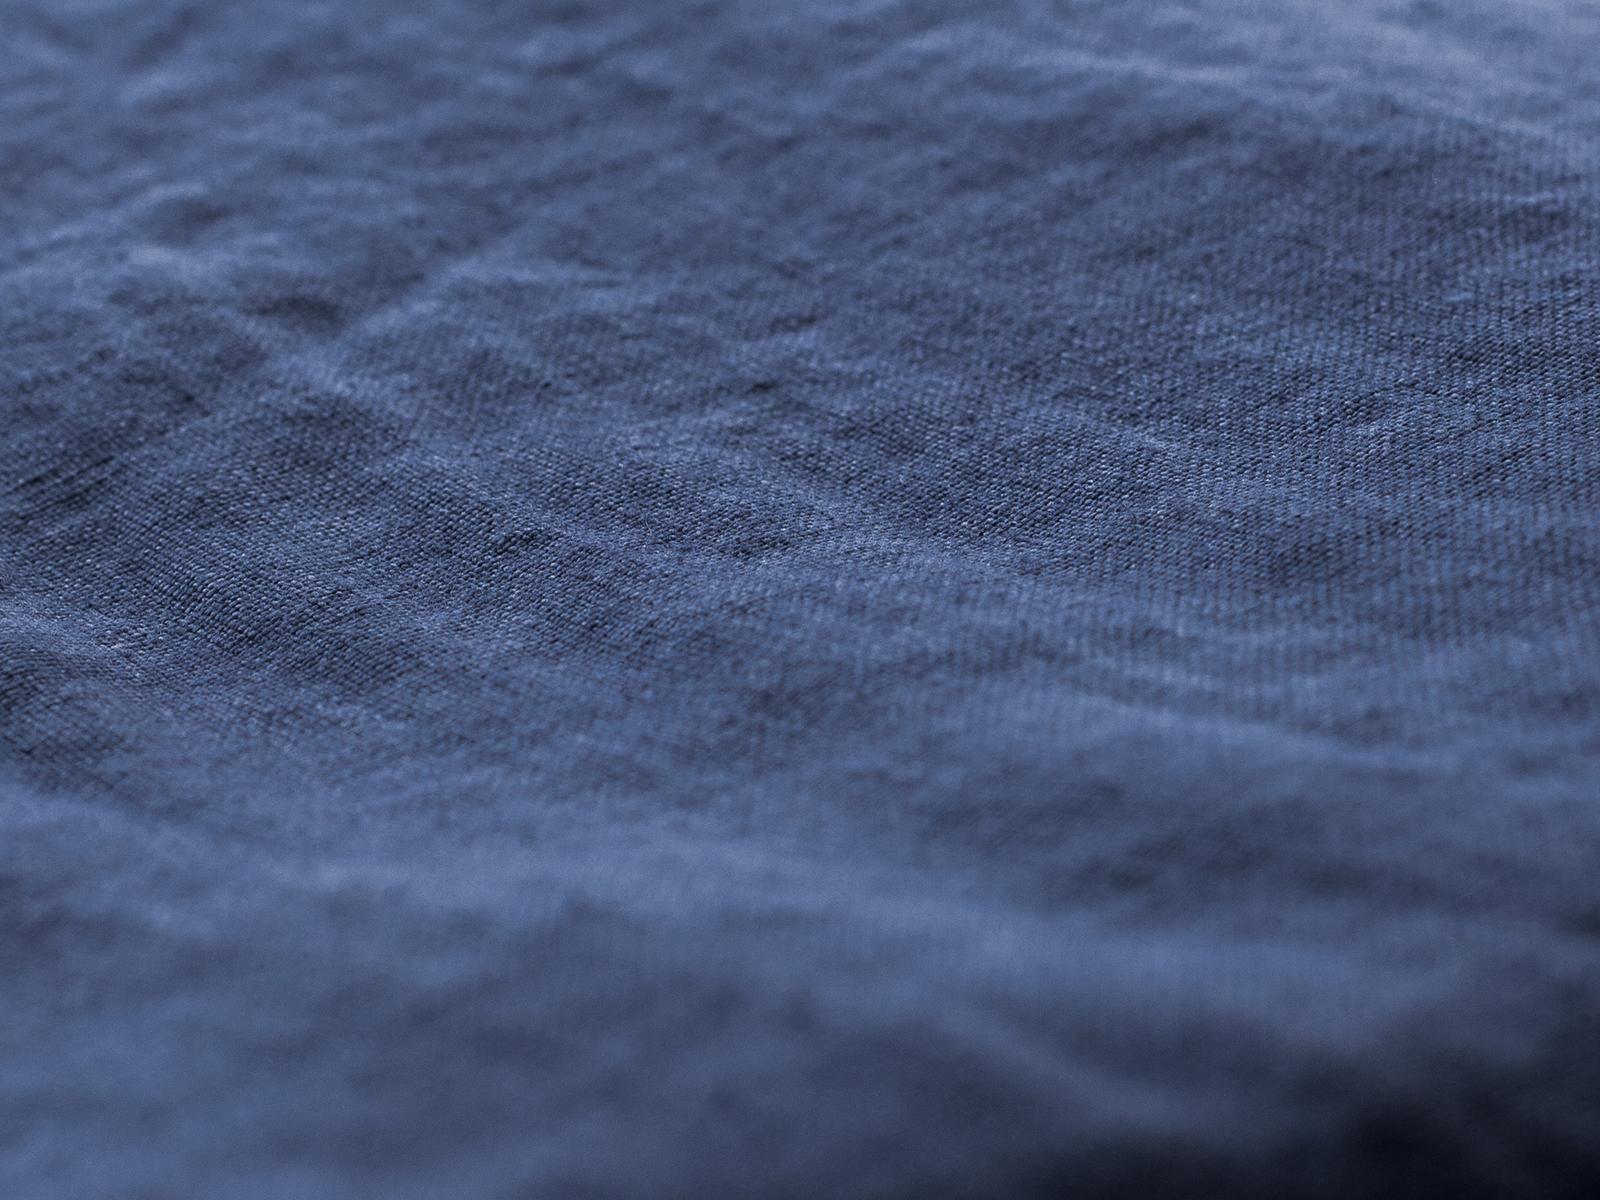 Cloth_LC_01.JPG